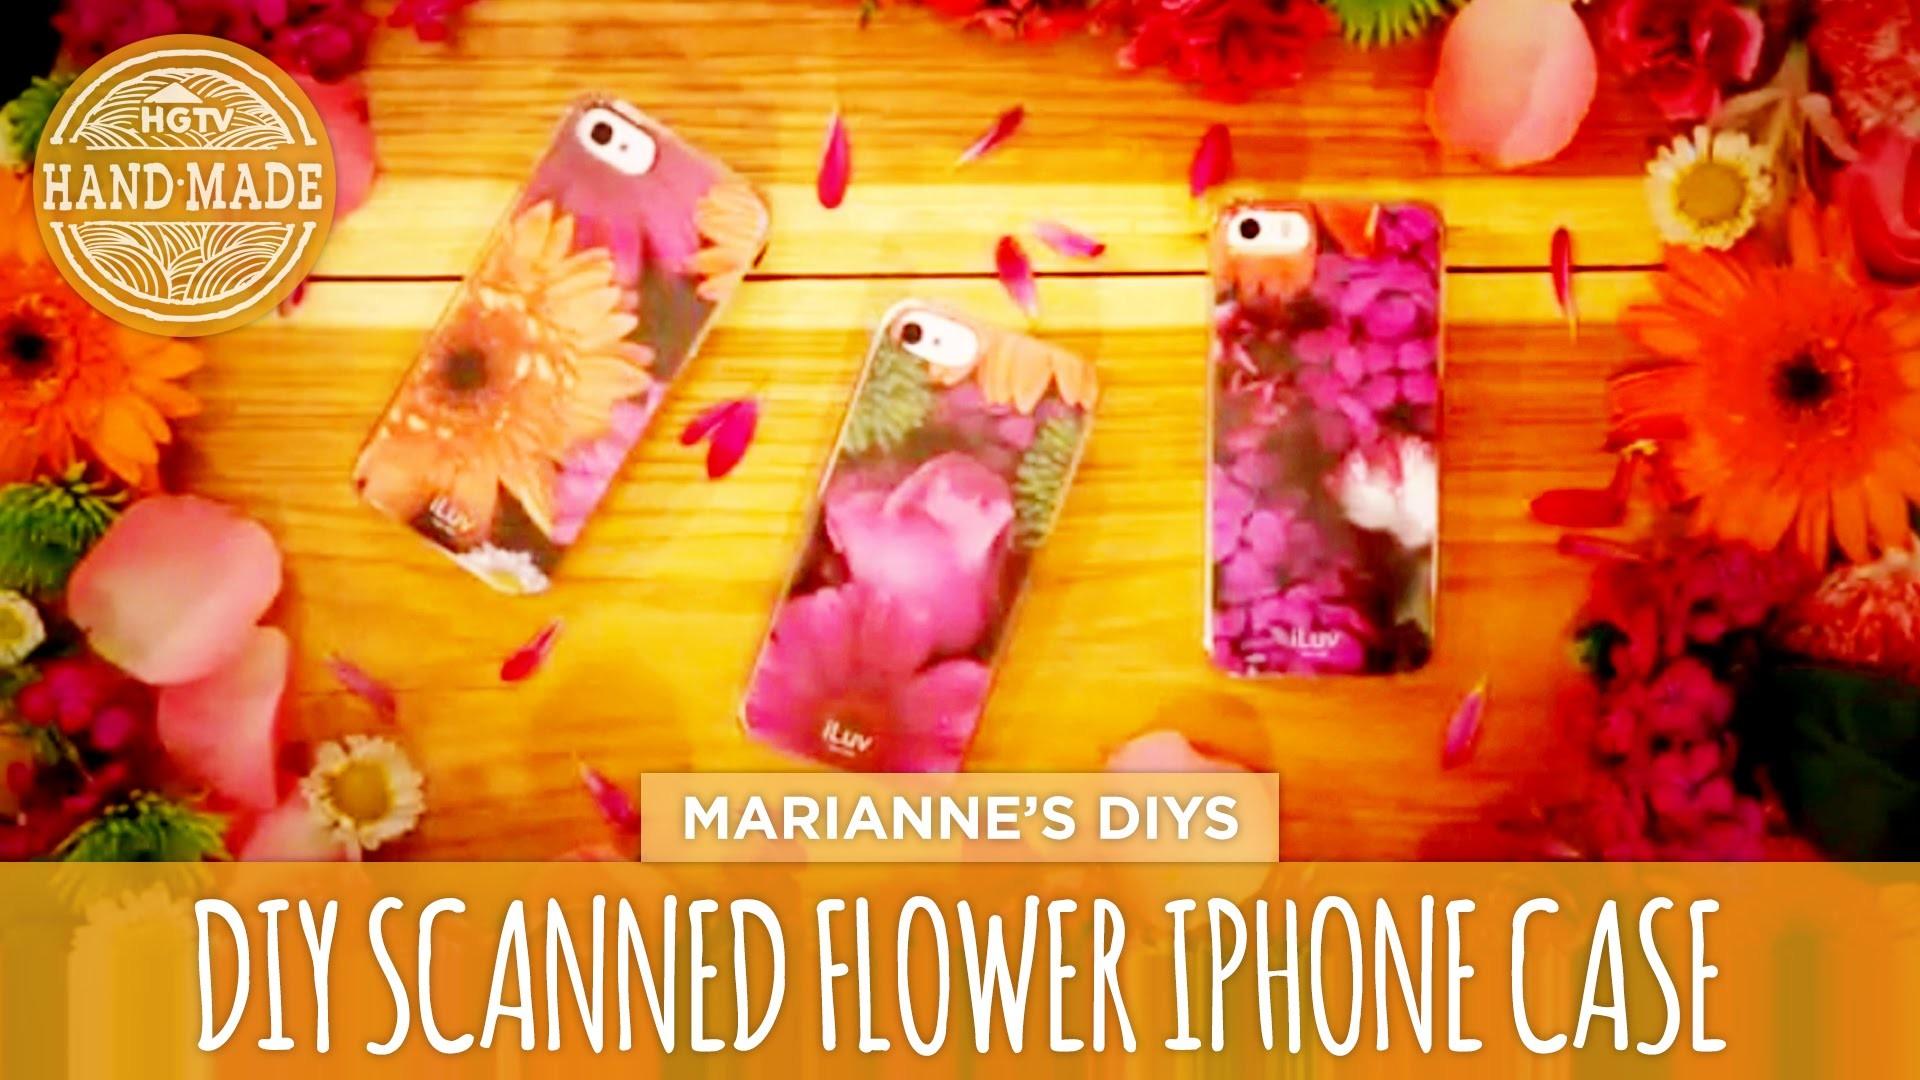 DIY Scanned Flower iPhone Case - HGTV Handmade